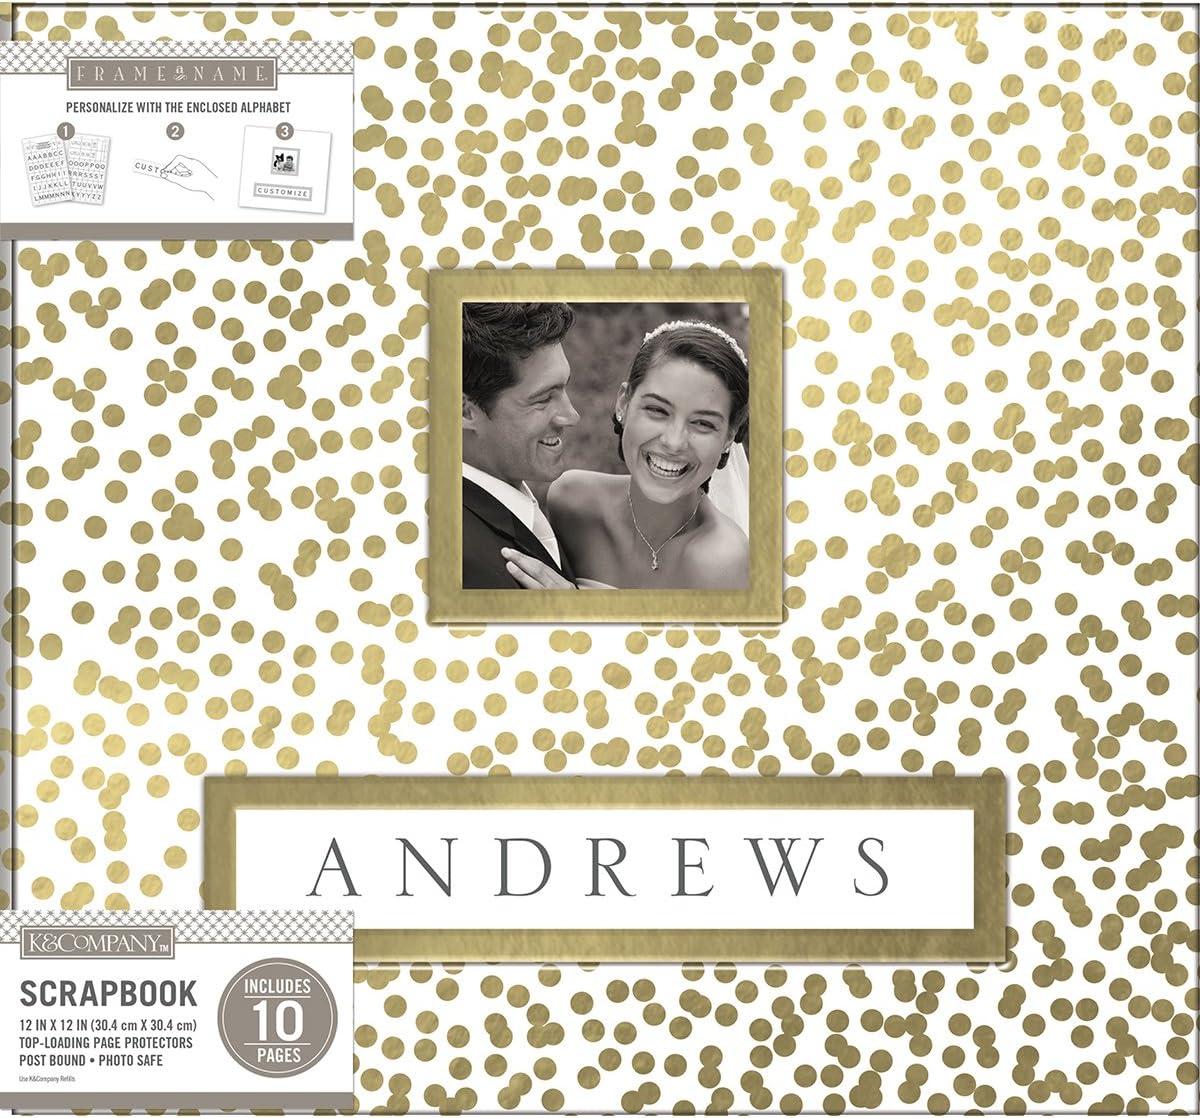 K /& Company KAC749382 K/&Co Scrapbook 12x12 Frame-A-Name Gold Foil Scattr Scrapbook 12x12 Goldfoilscttr